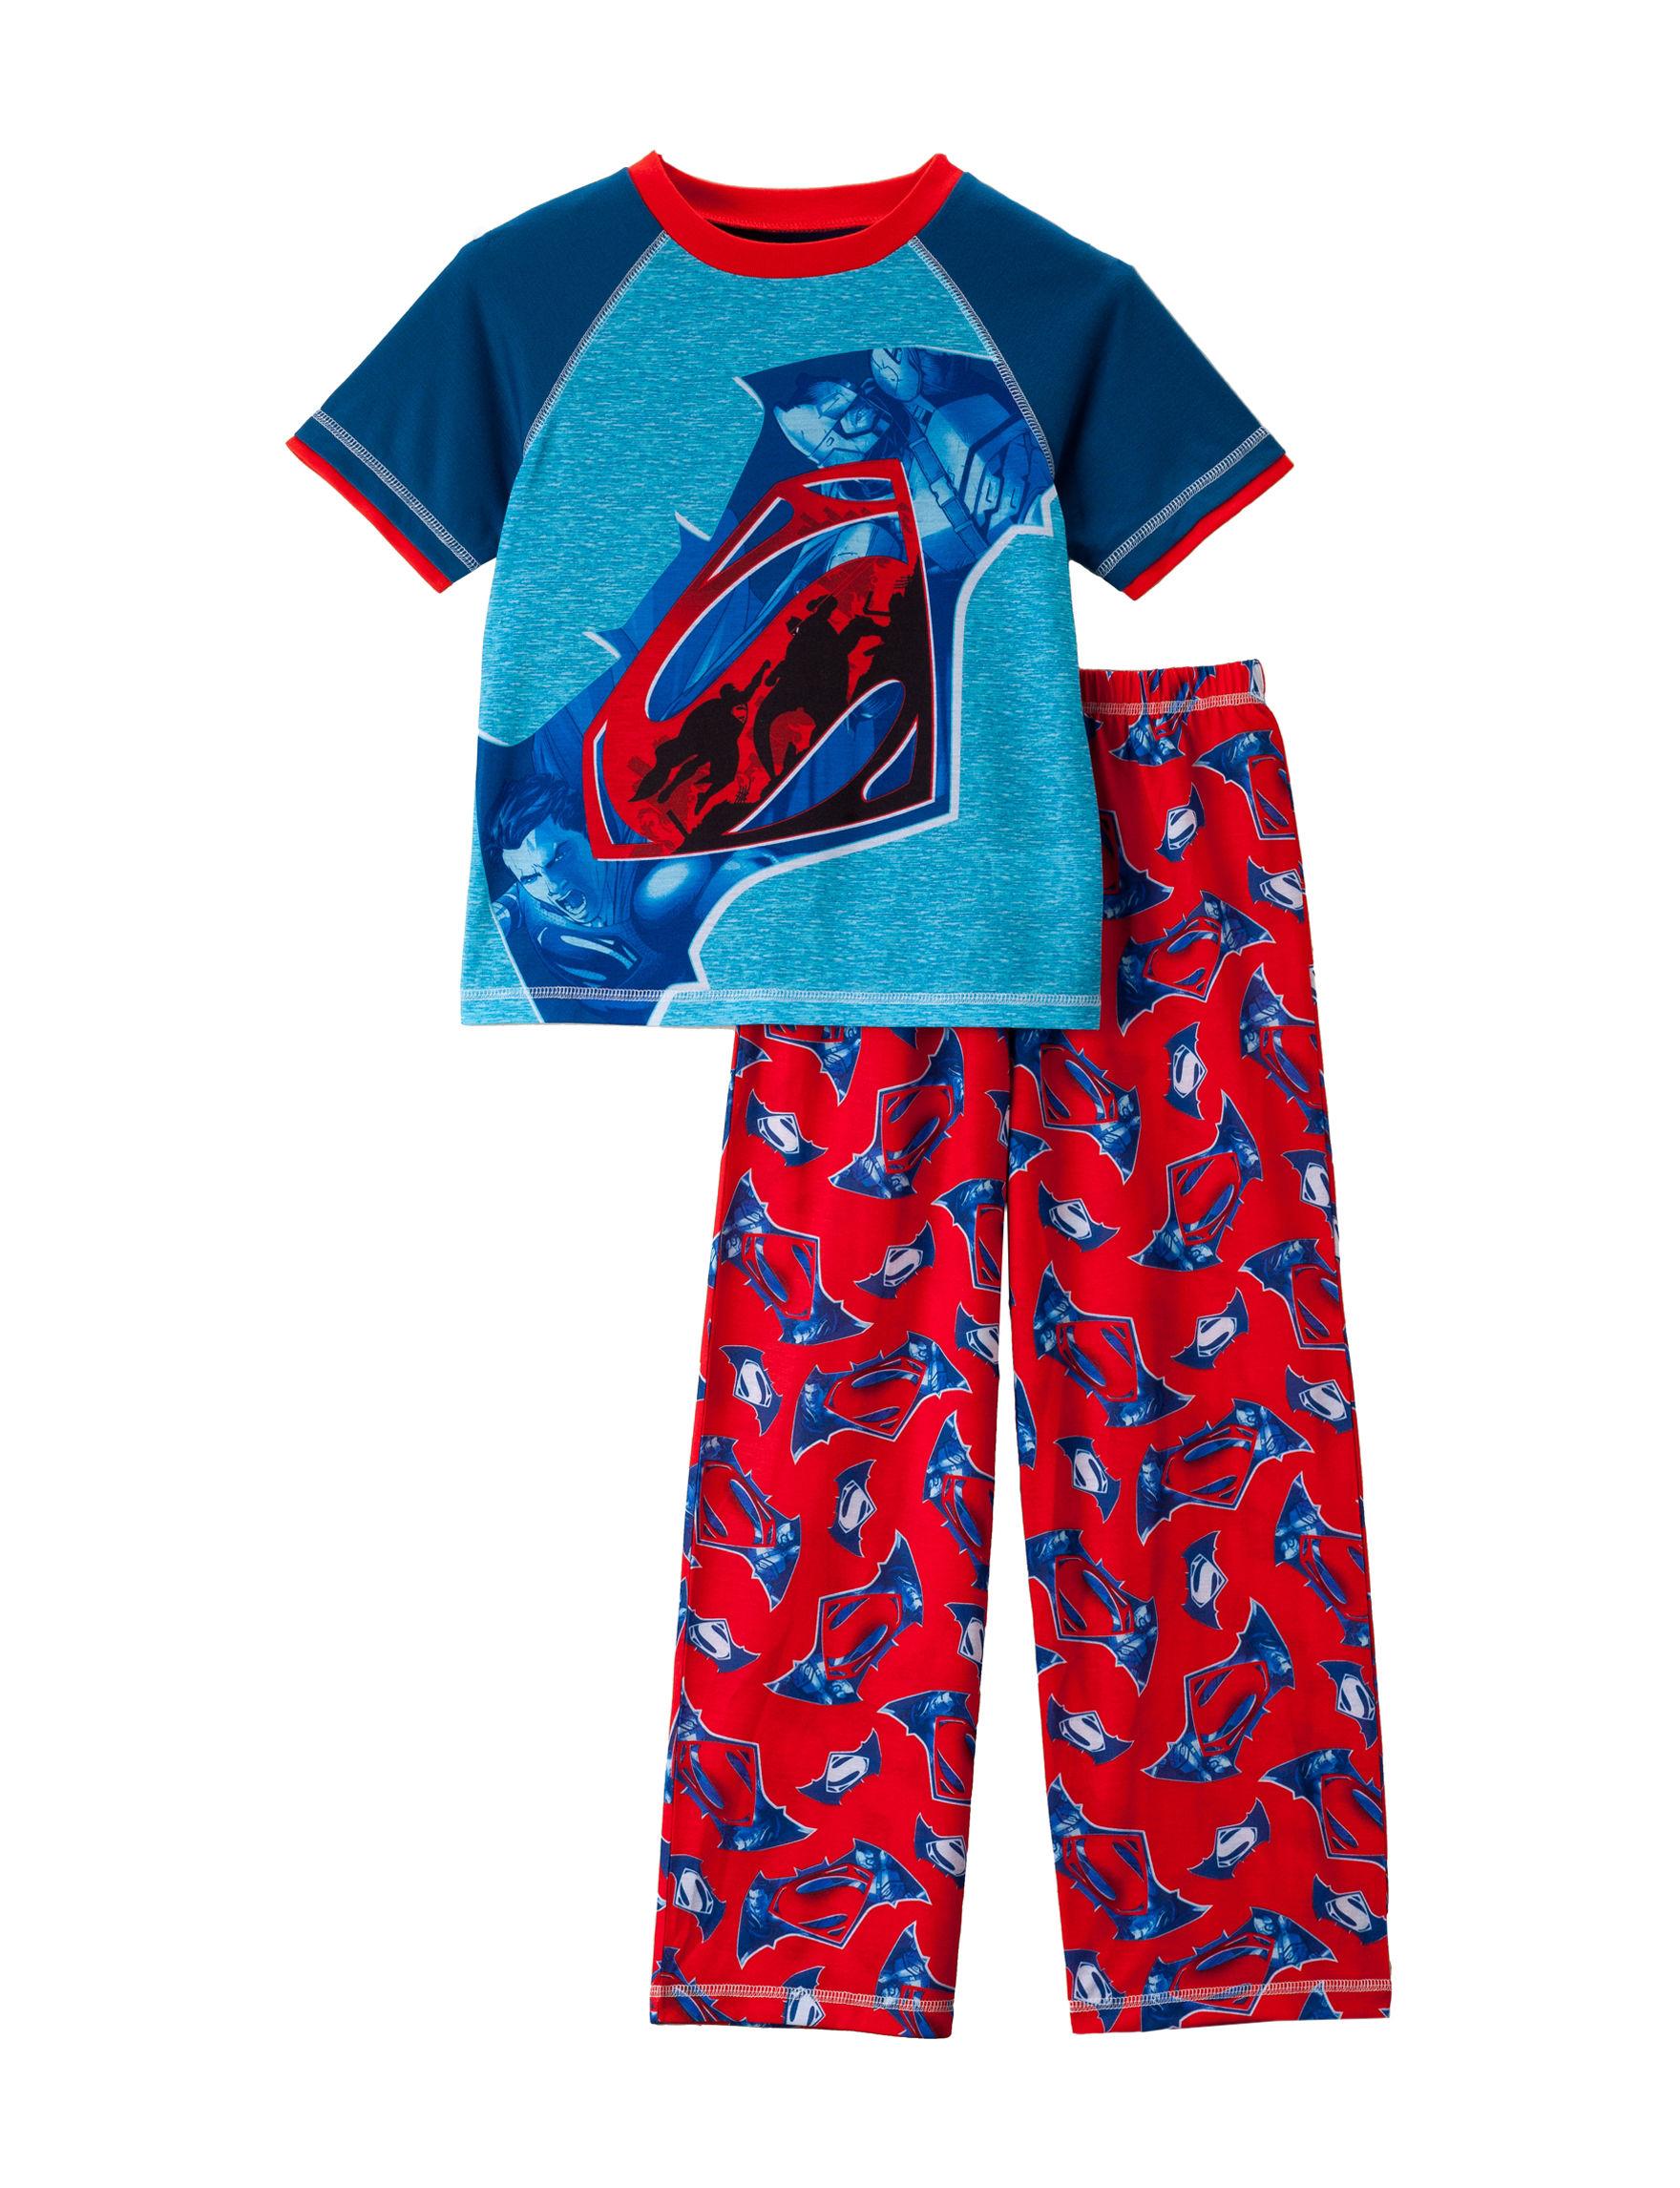 Licensed Red Pajama Sets